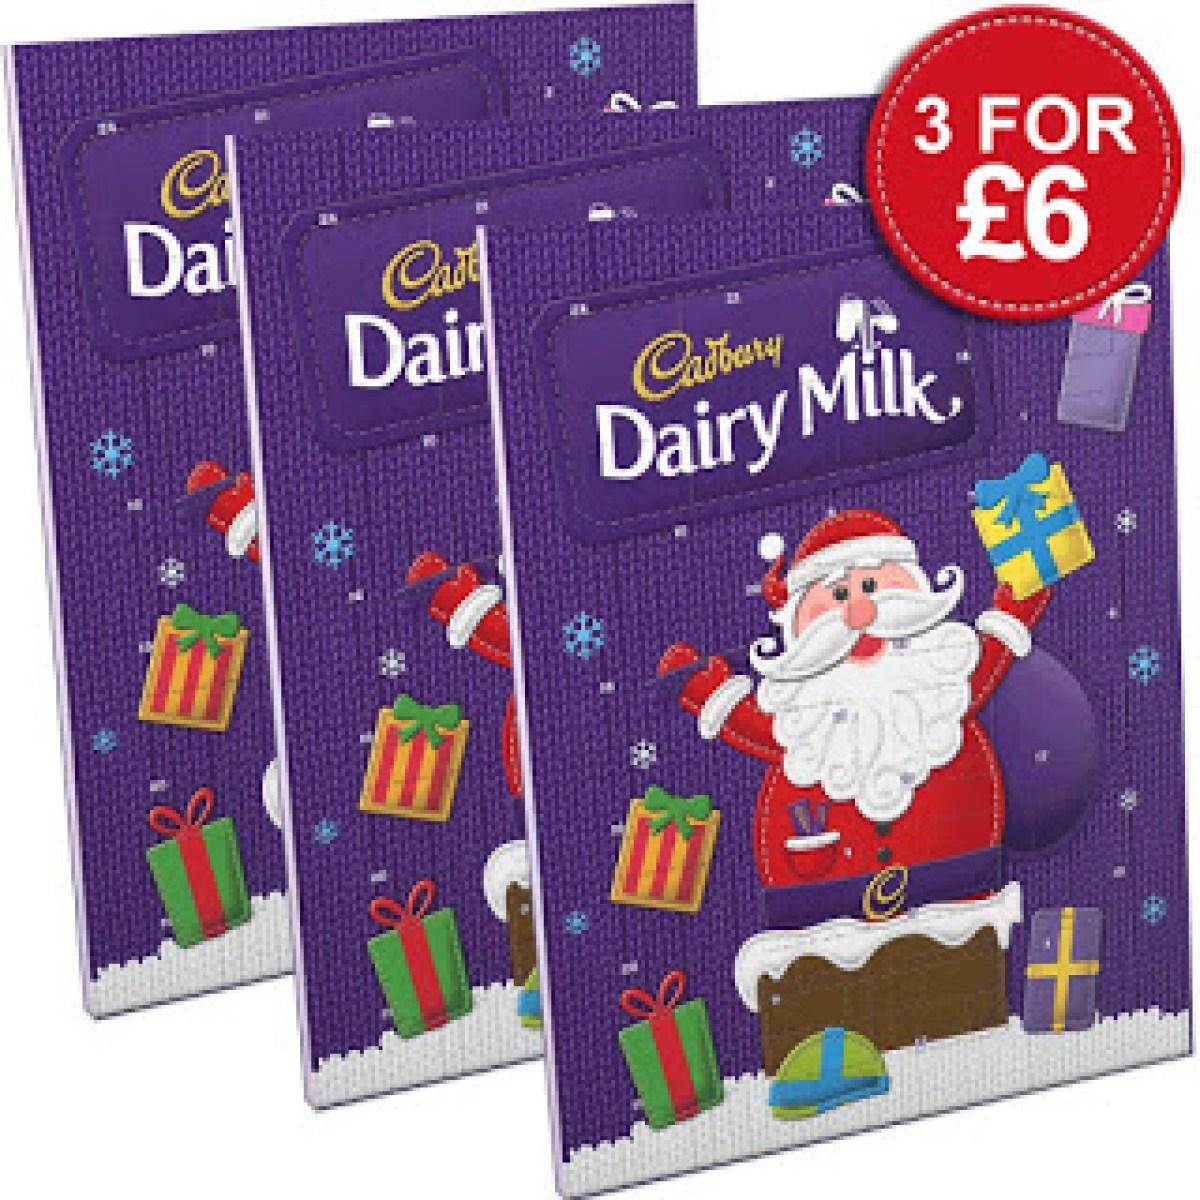 3 cadbury chocolate advent calendars